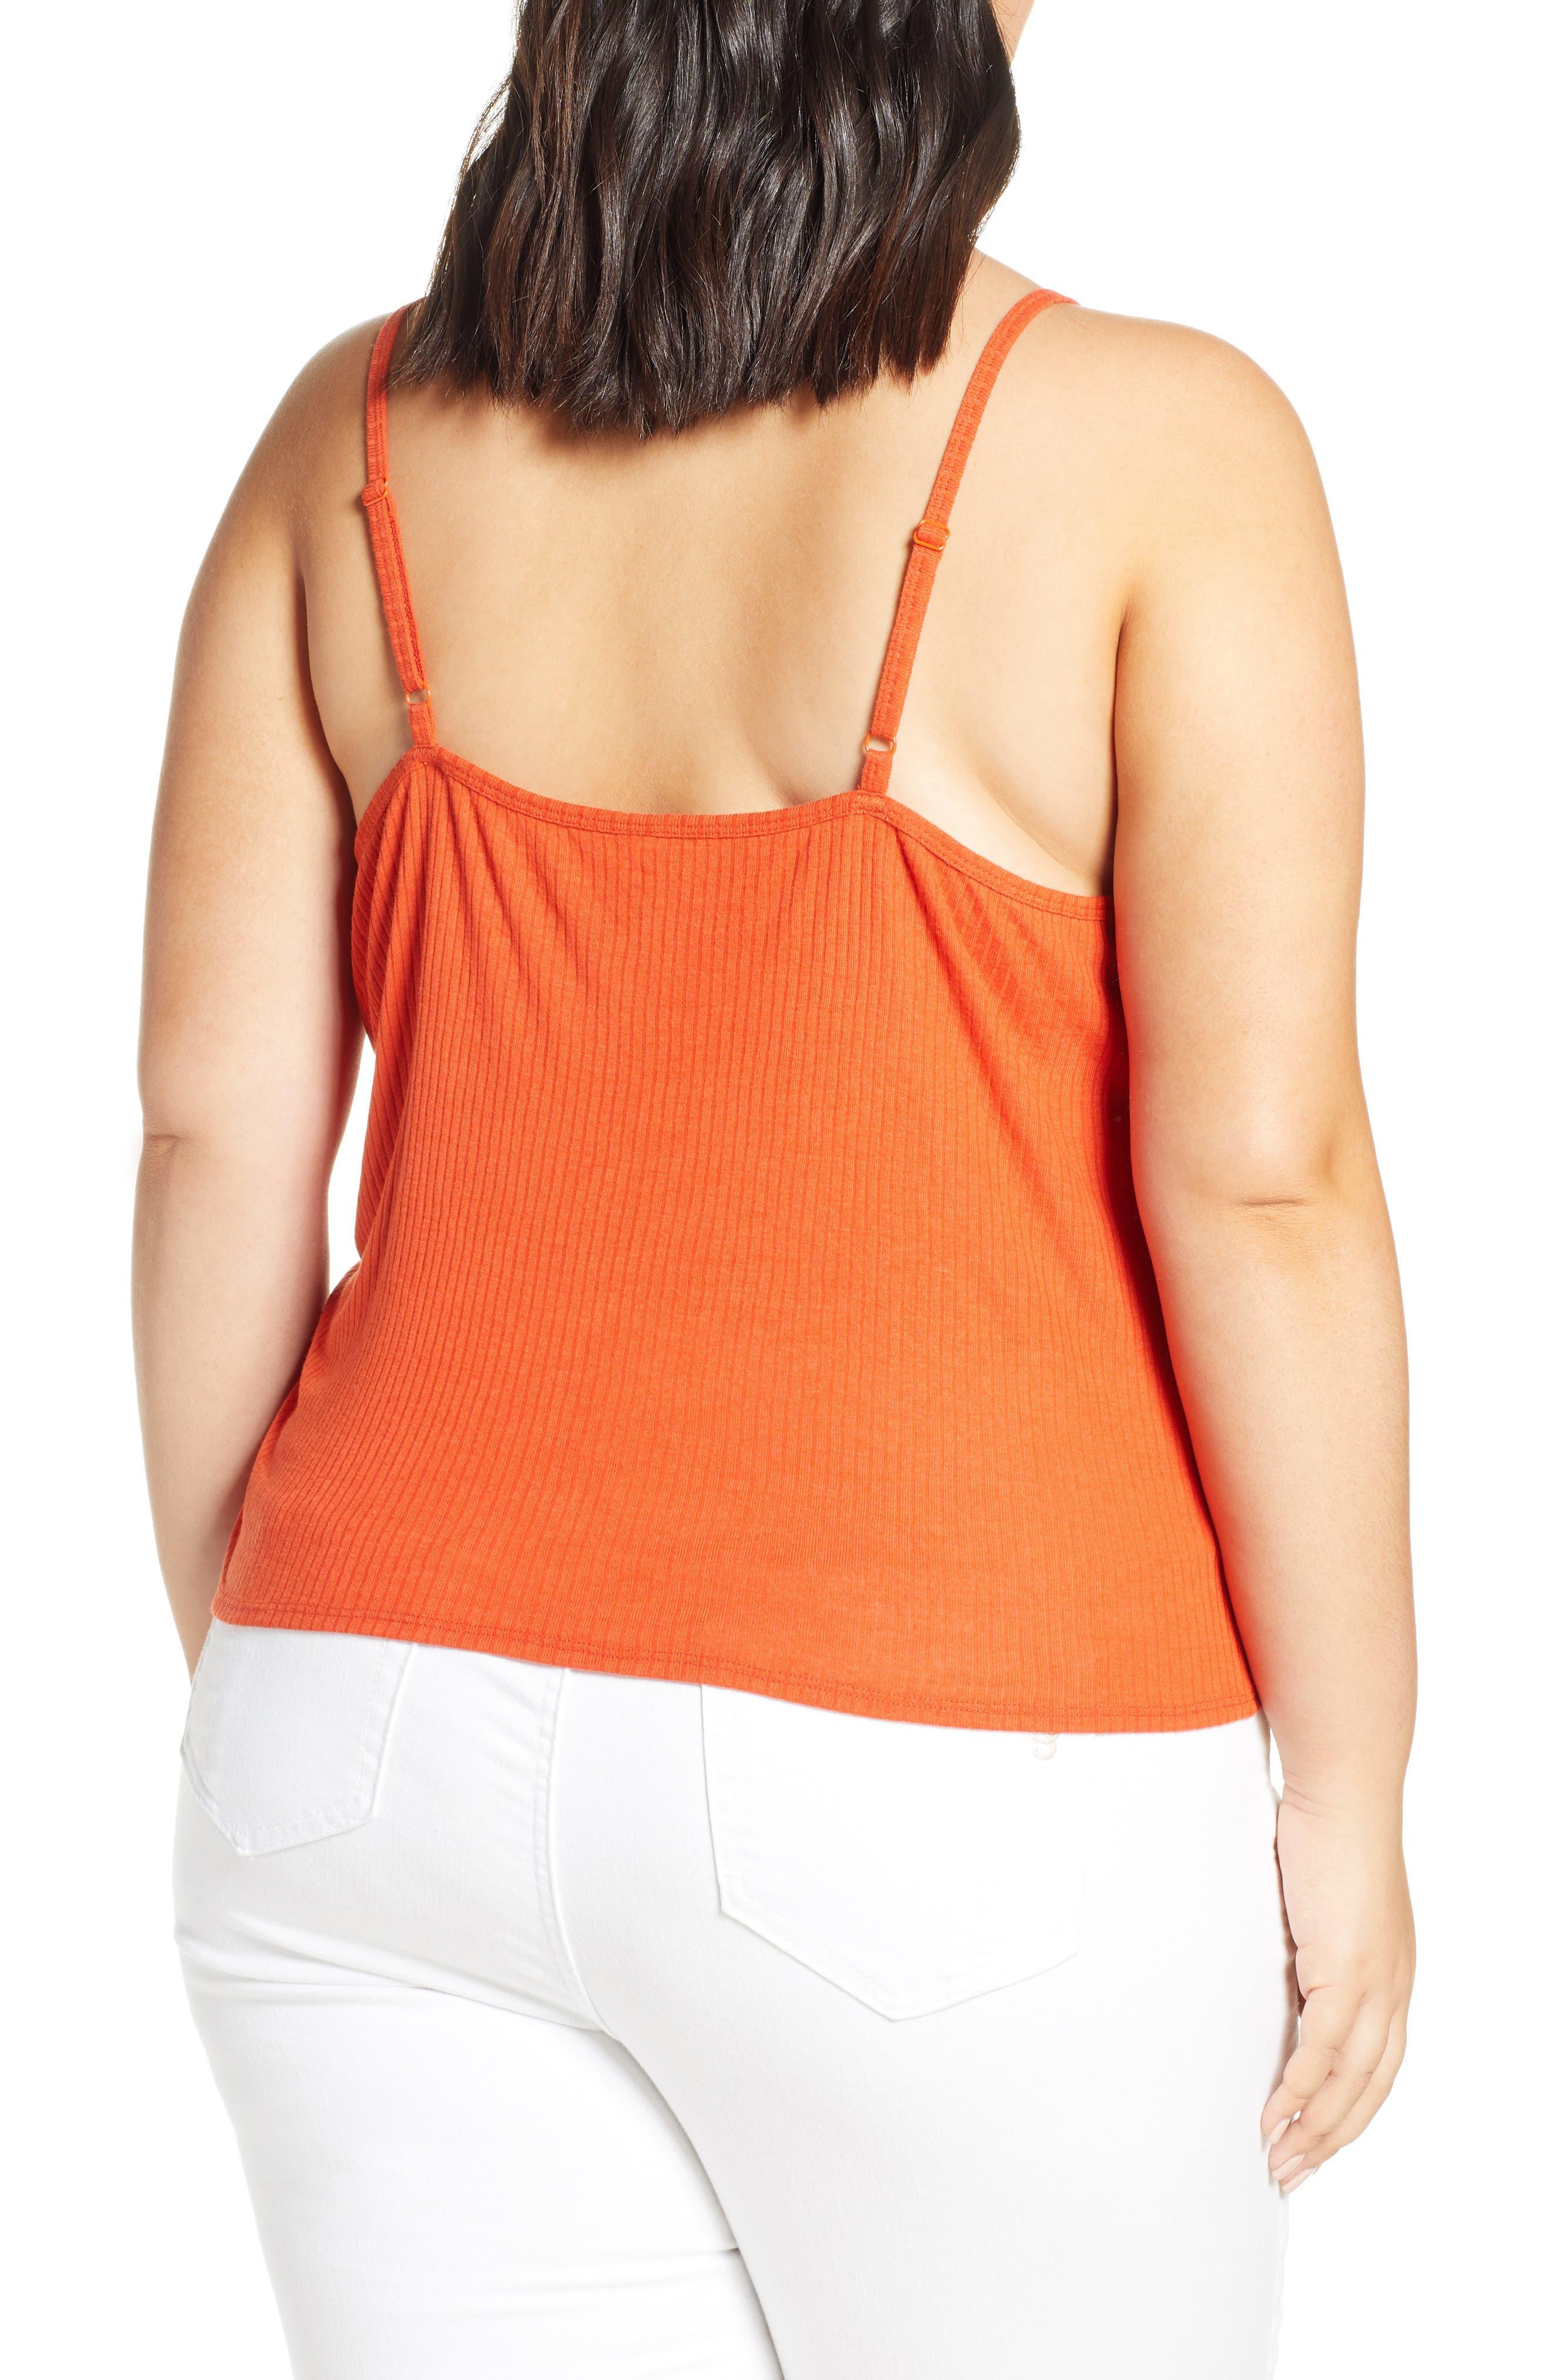 323e40f671ec4 orange tank tops for women